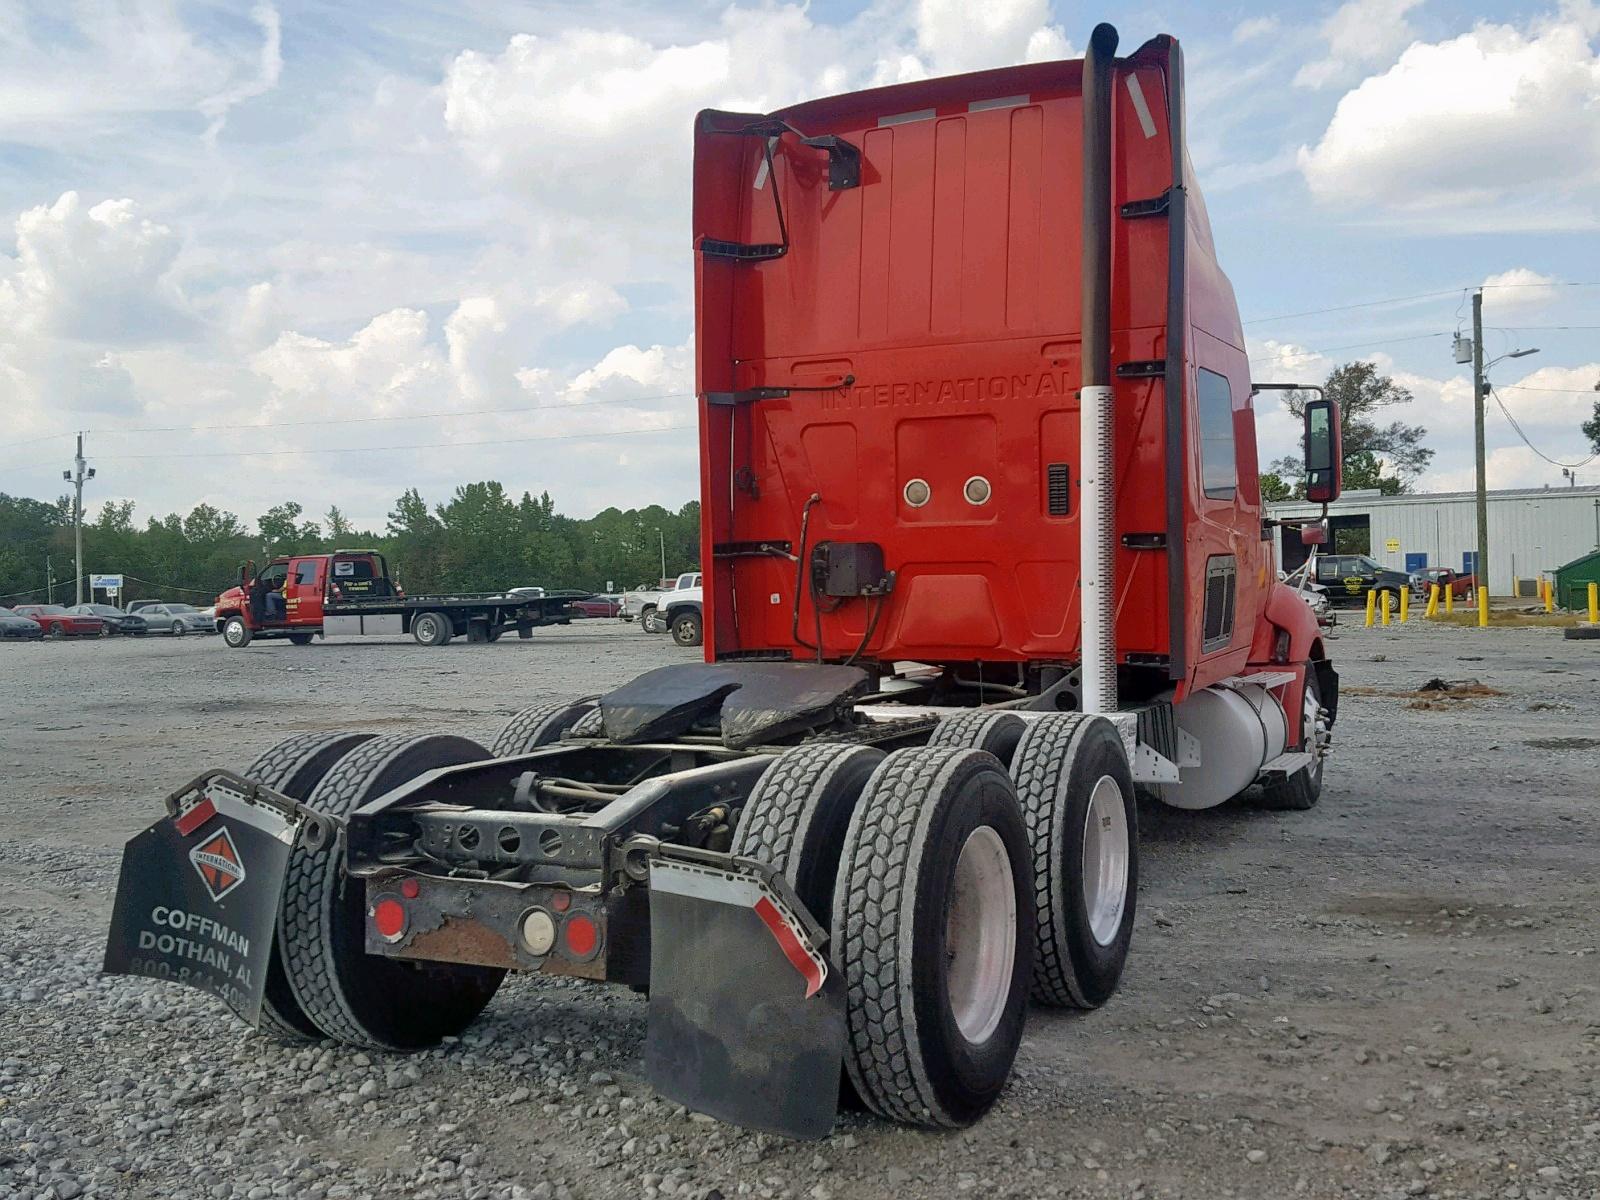 3HSCUAPR7AN193422 - 2010 International Prostar Pr 14.9L rear view